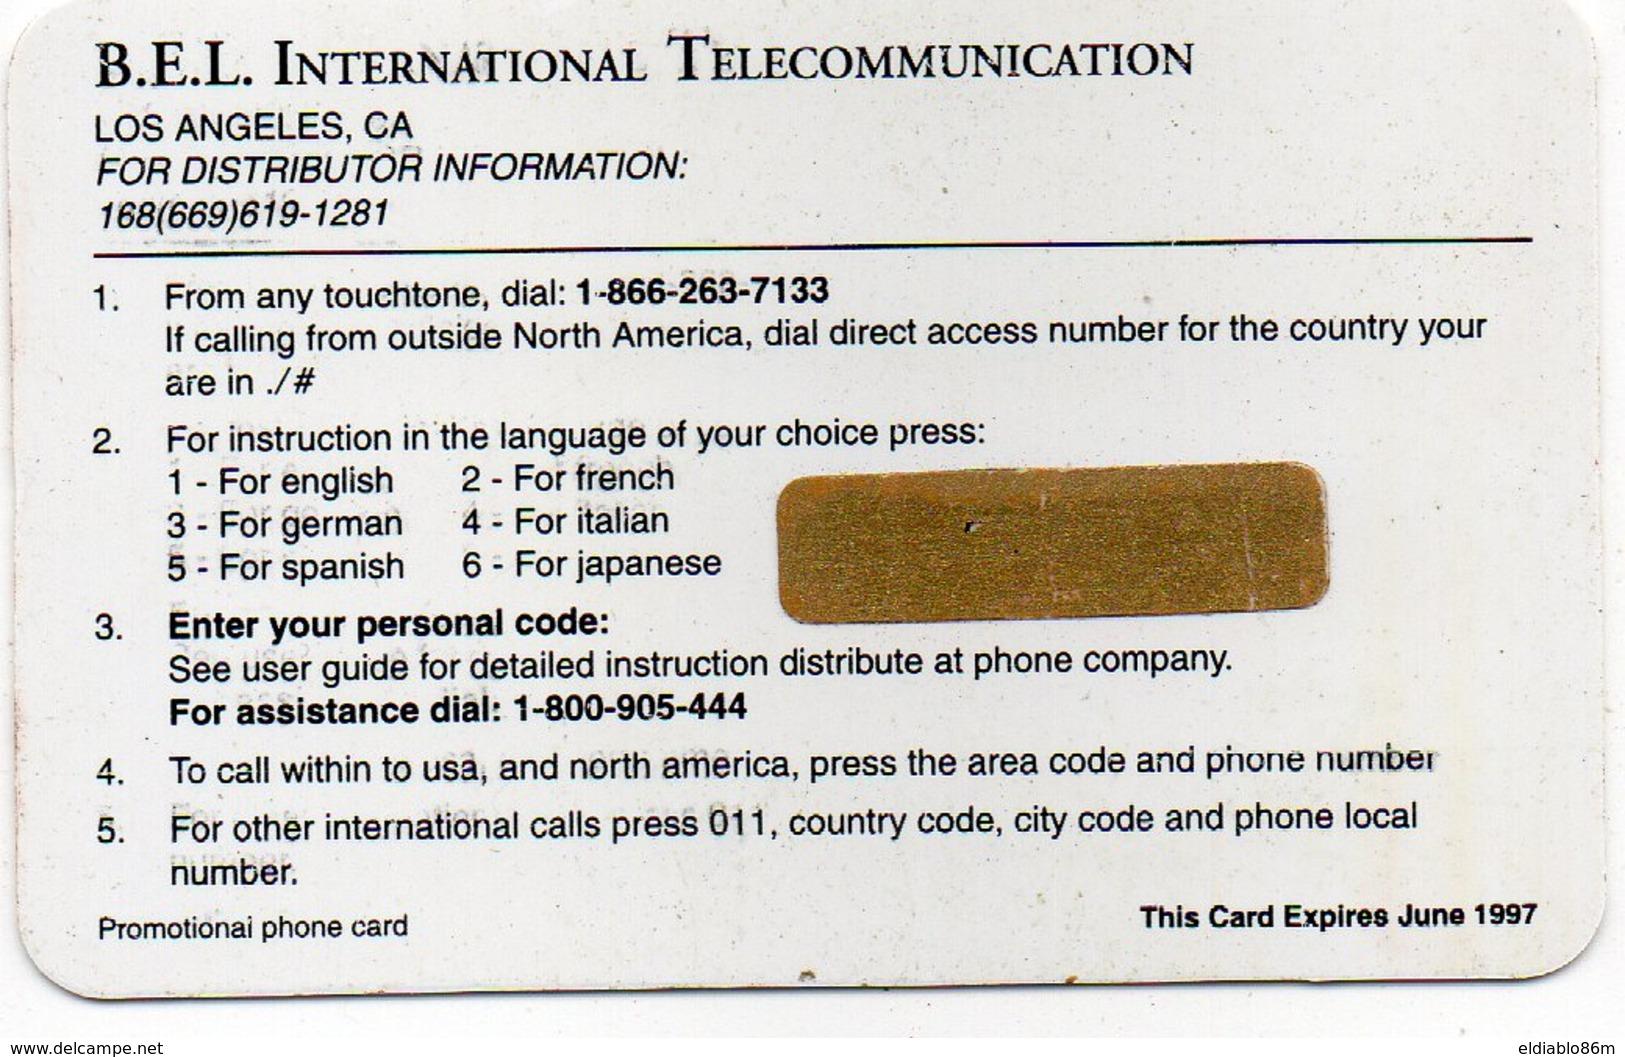 UNITED STATES - B.E.L. - THEMATIC CARTOON MOVIE - WALT DISNEY - ONE HUNDRED AND ONE DALMATIANS LA CARICA DEI 101 - MINT - Andere